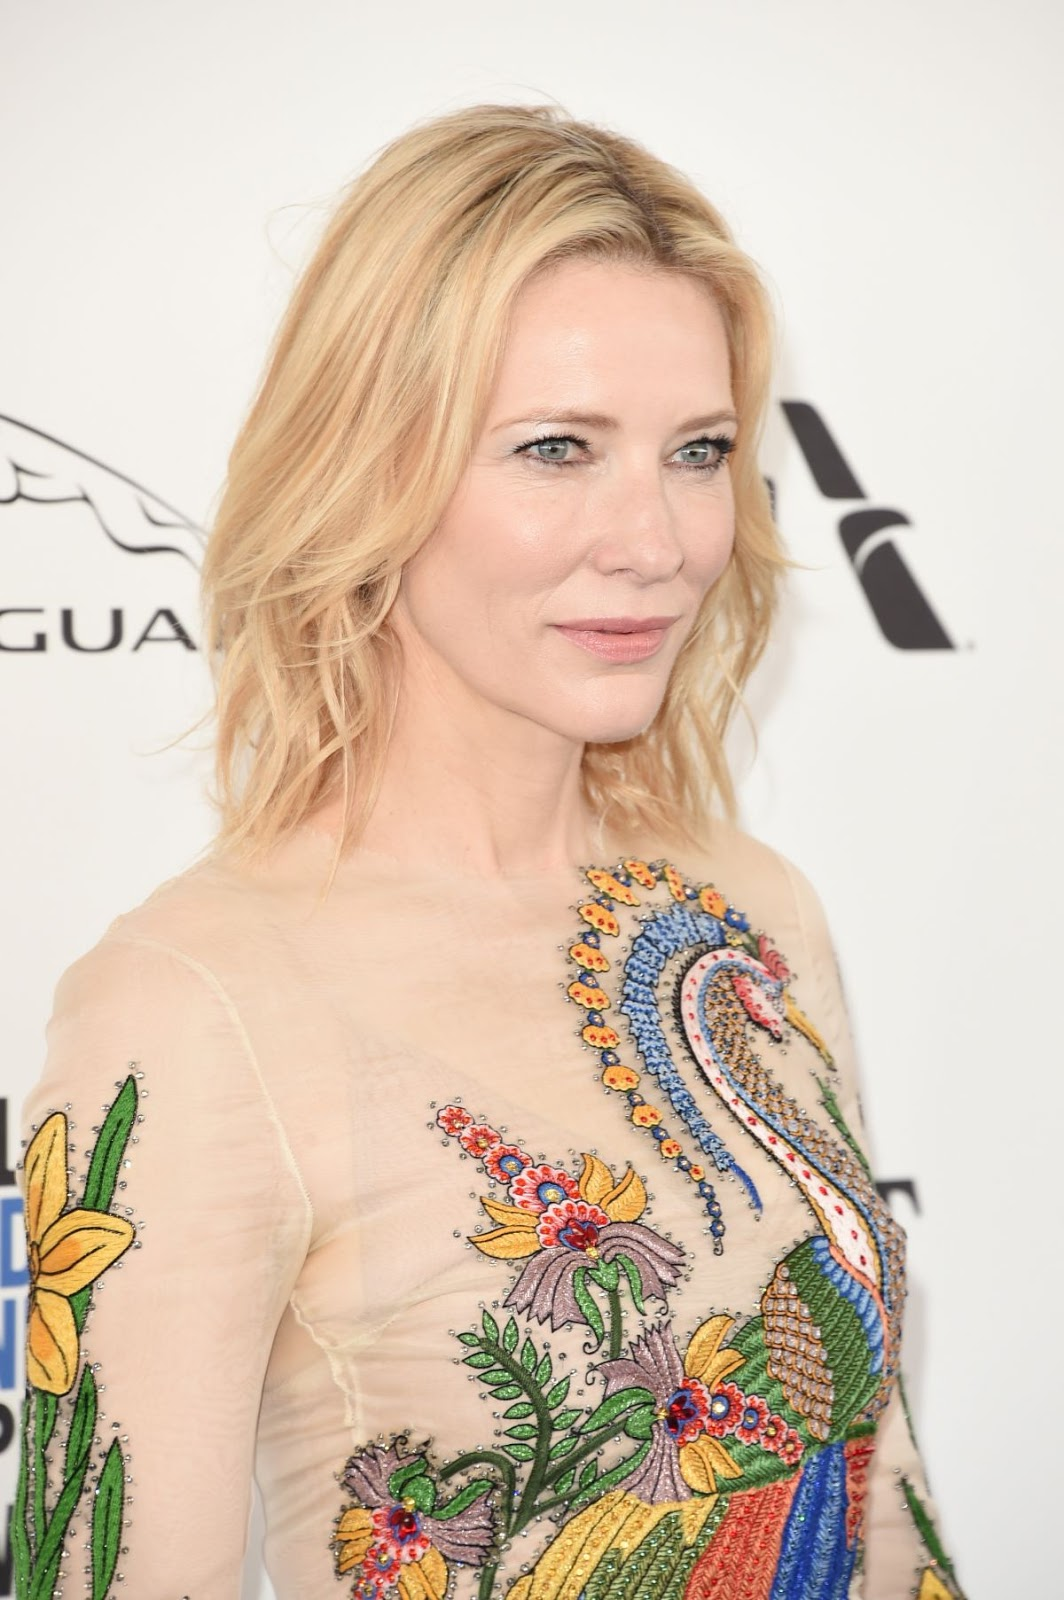 Manifesto actress Cate Blanchett at Film Independent Spirit Awards in Santa Monica